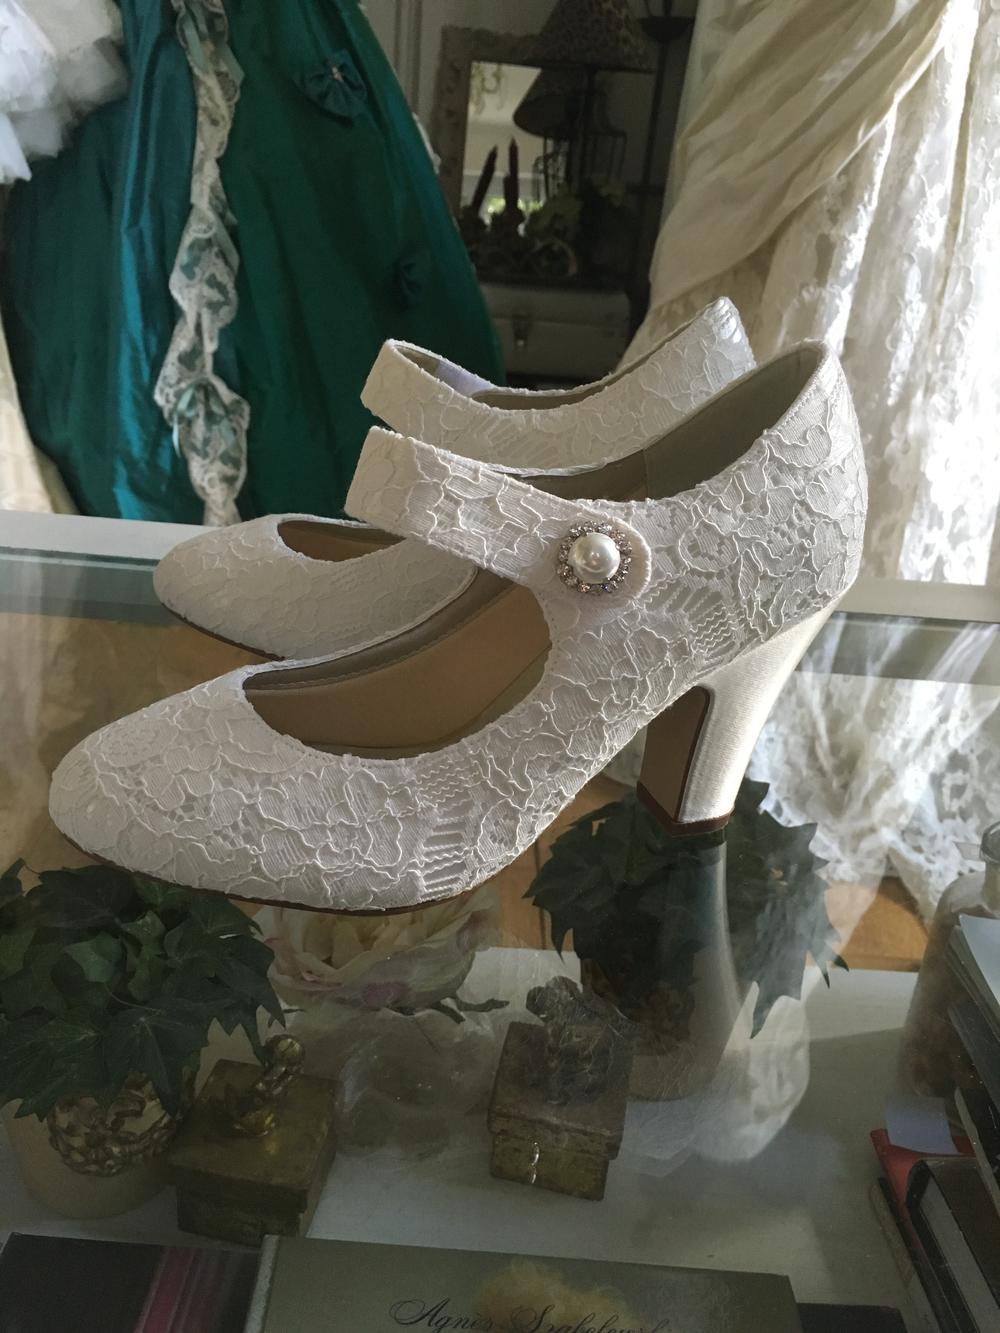 Chaussures de mariee dentelle Agnes Szabelewski.jpg